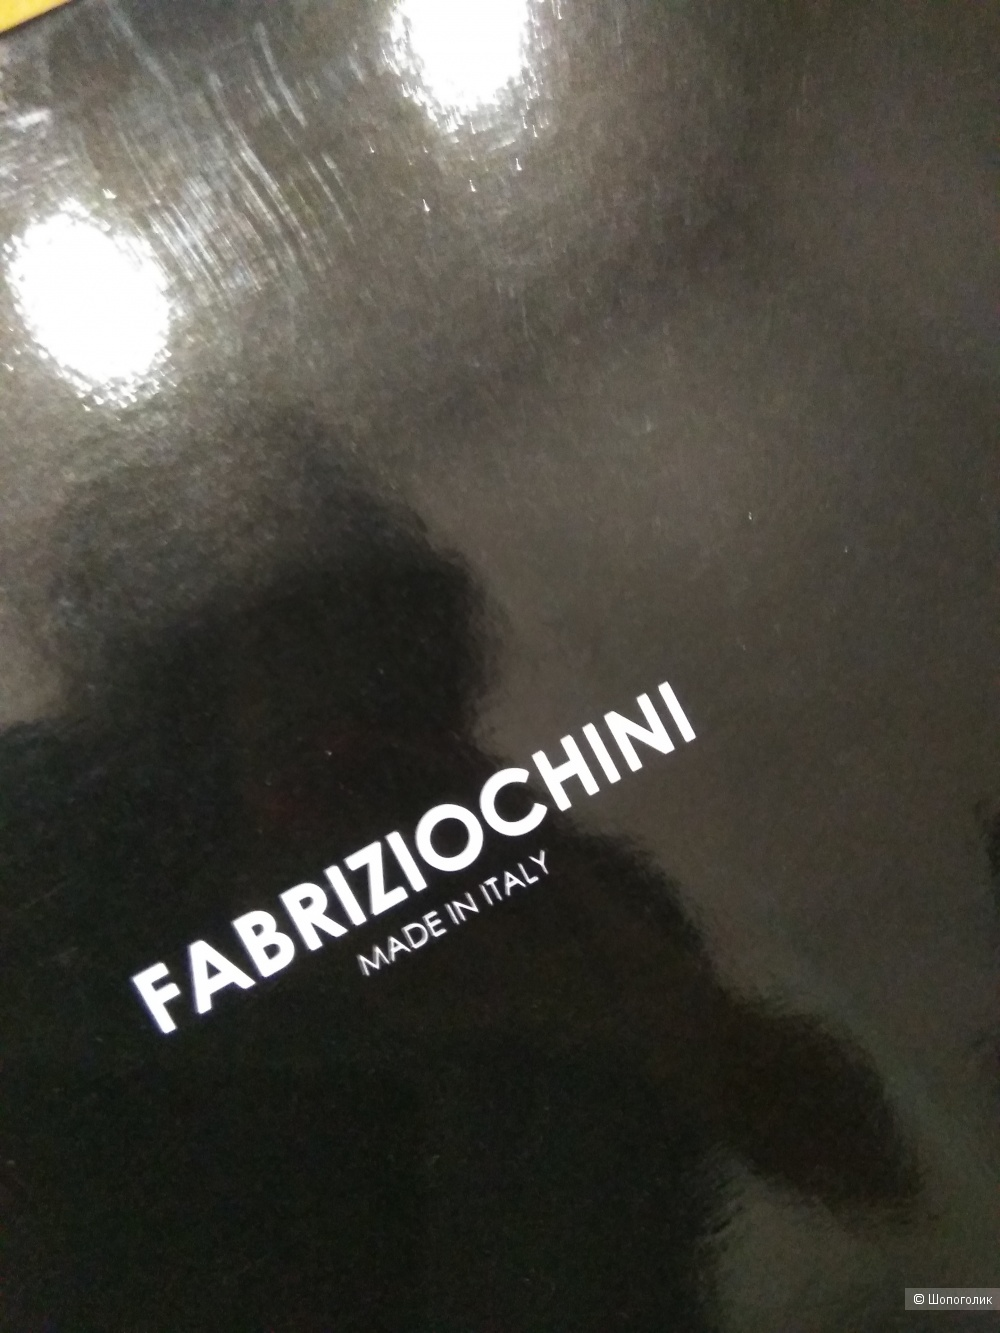 Сапоги Ботфорты Fabriziochini Италия 36-36.5 размер